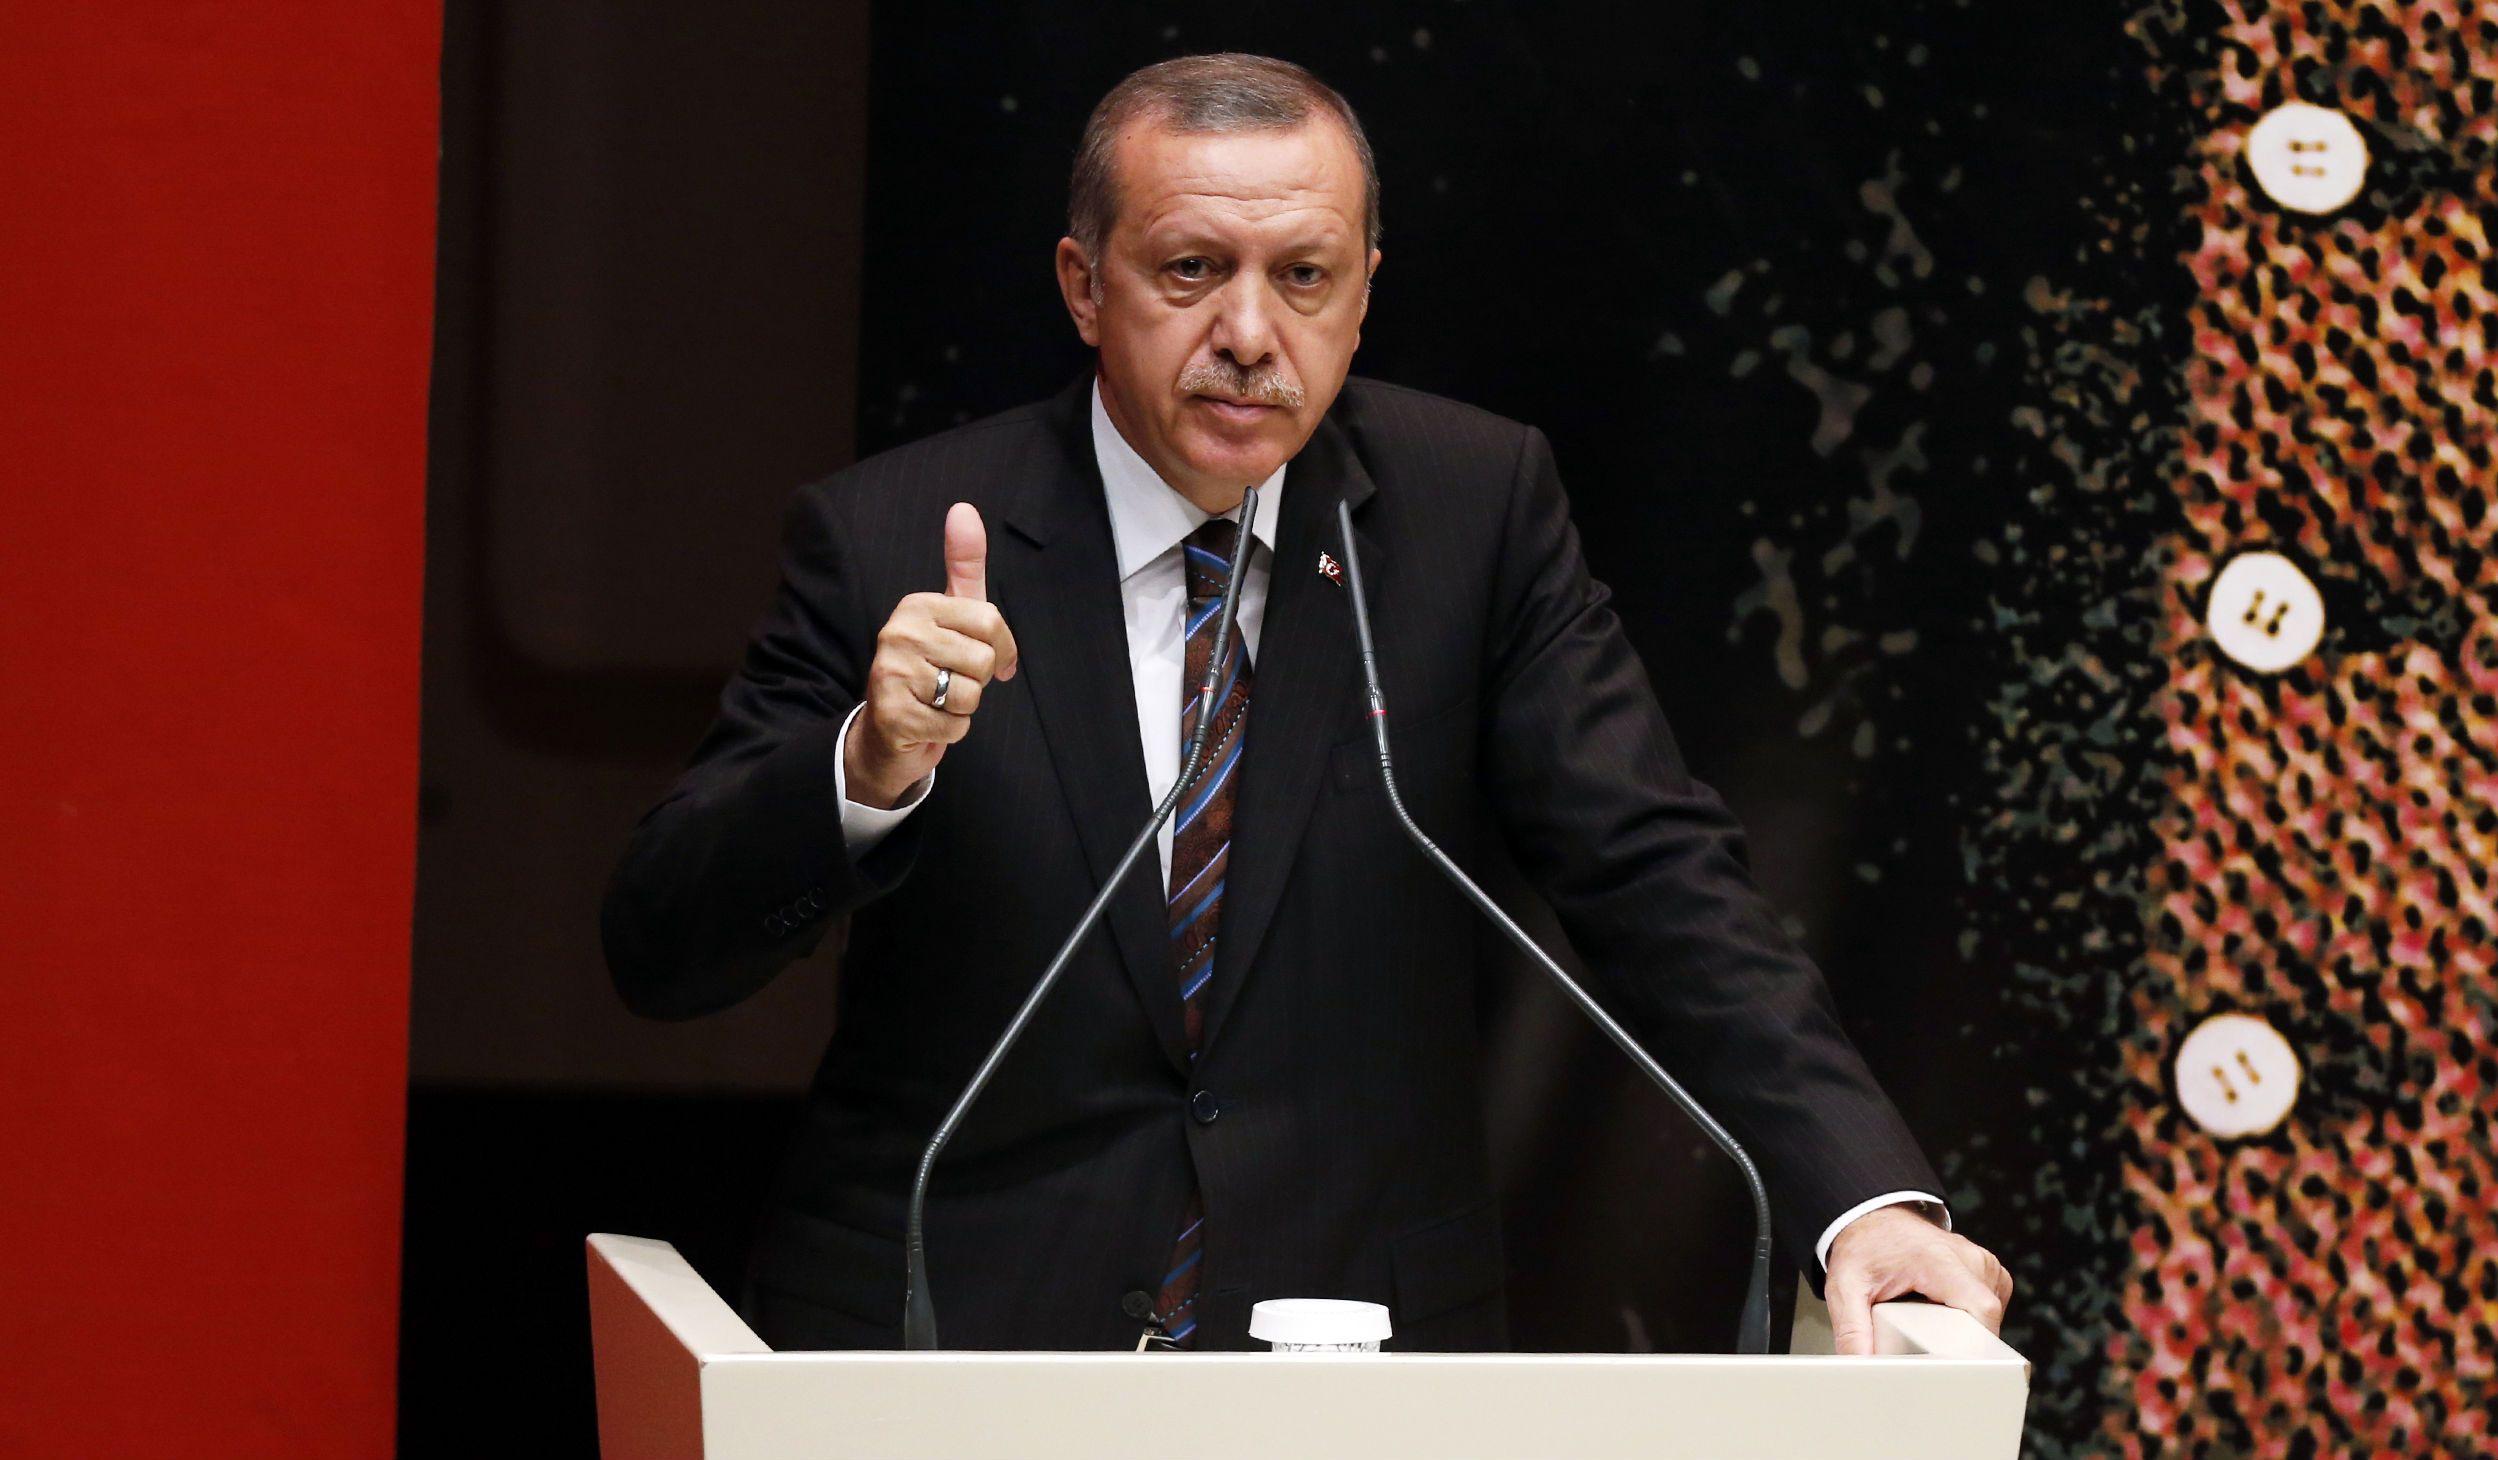 Erdogan thumbs up